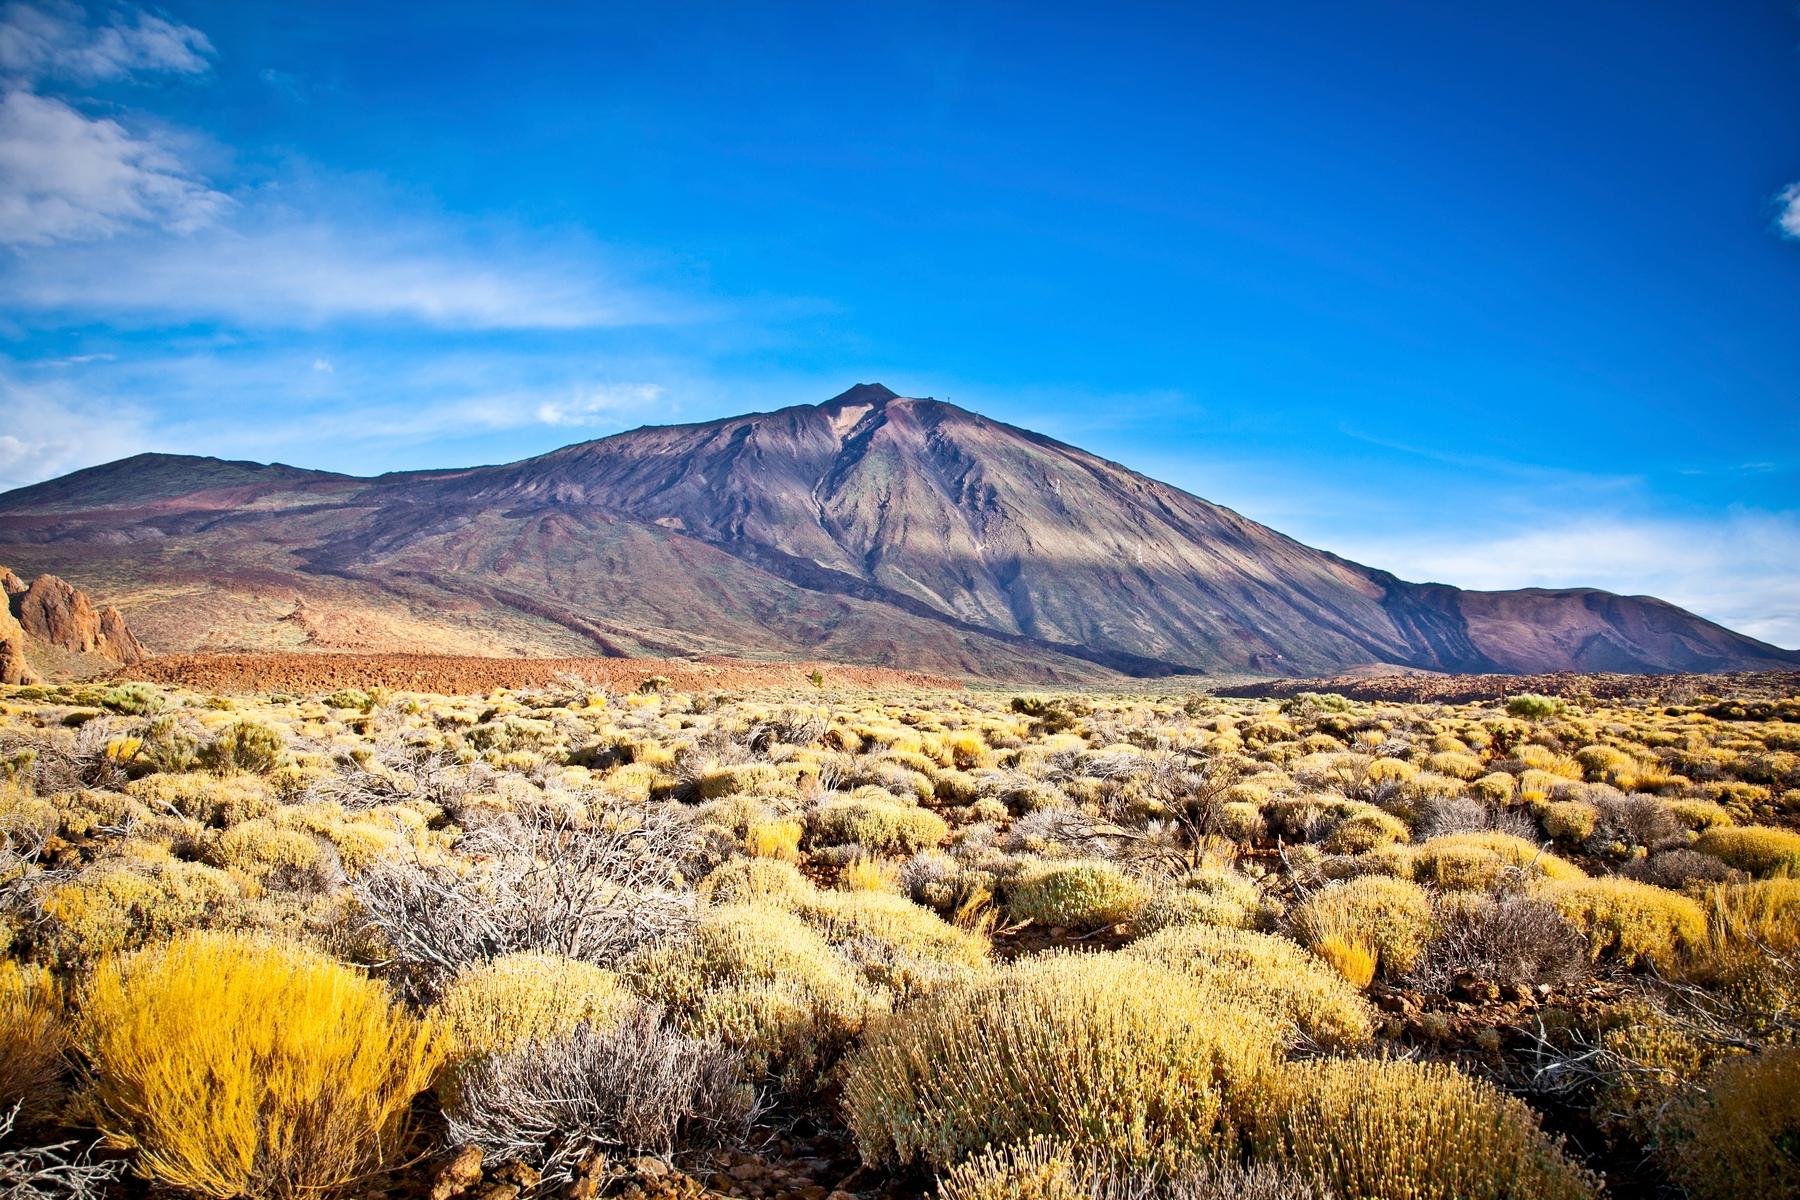 The Teide volcano - Ireland public holidays